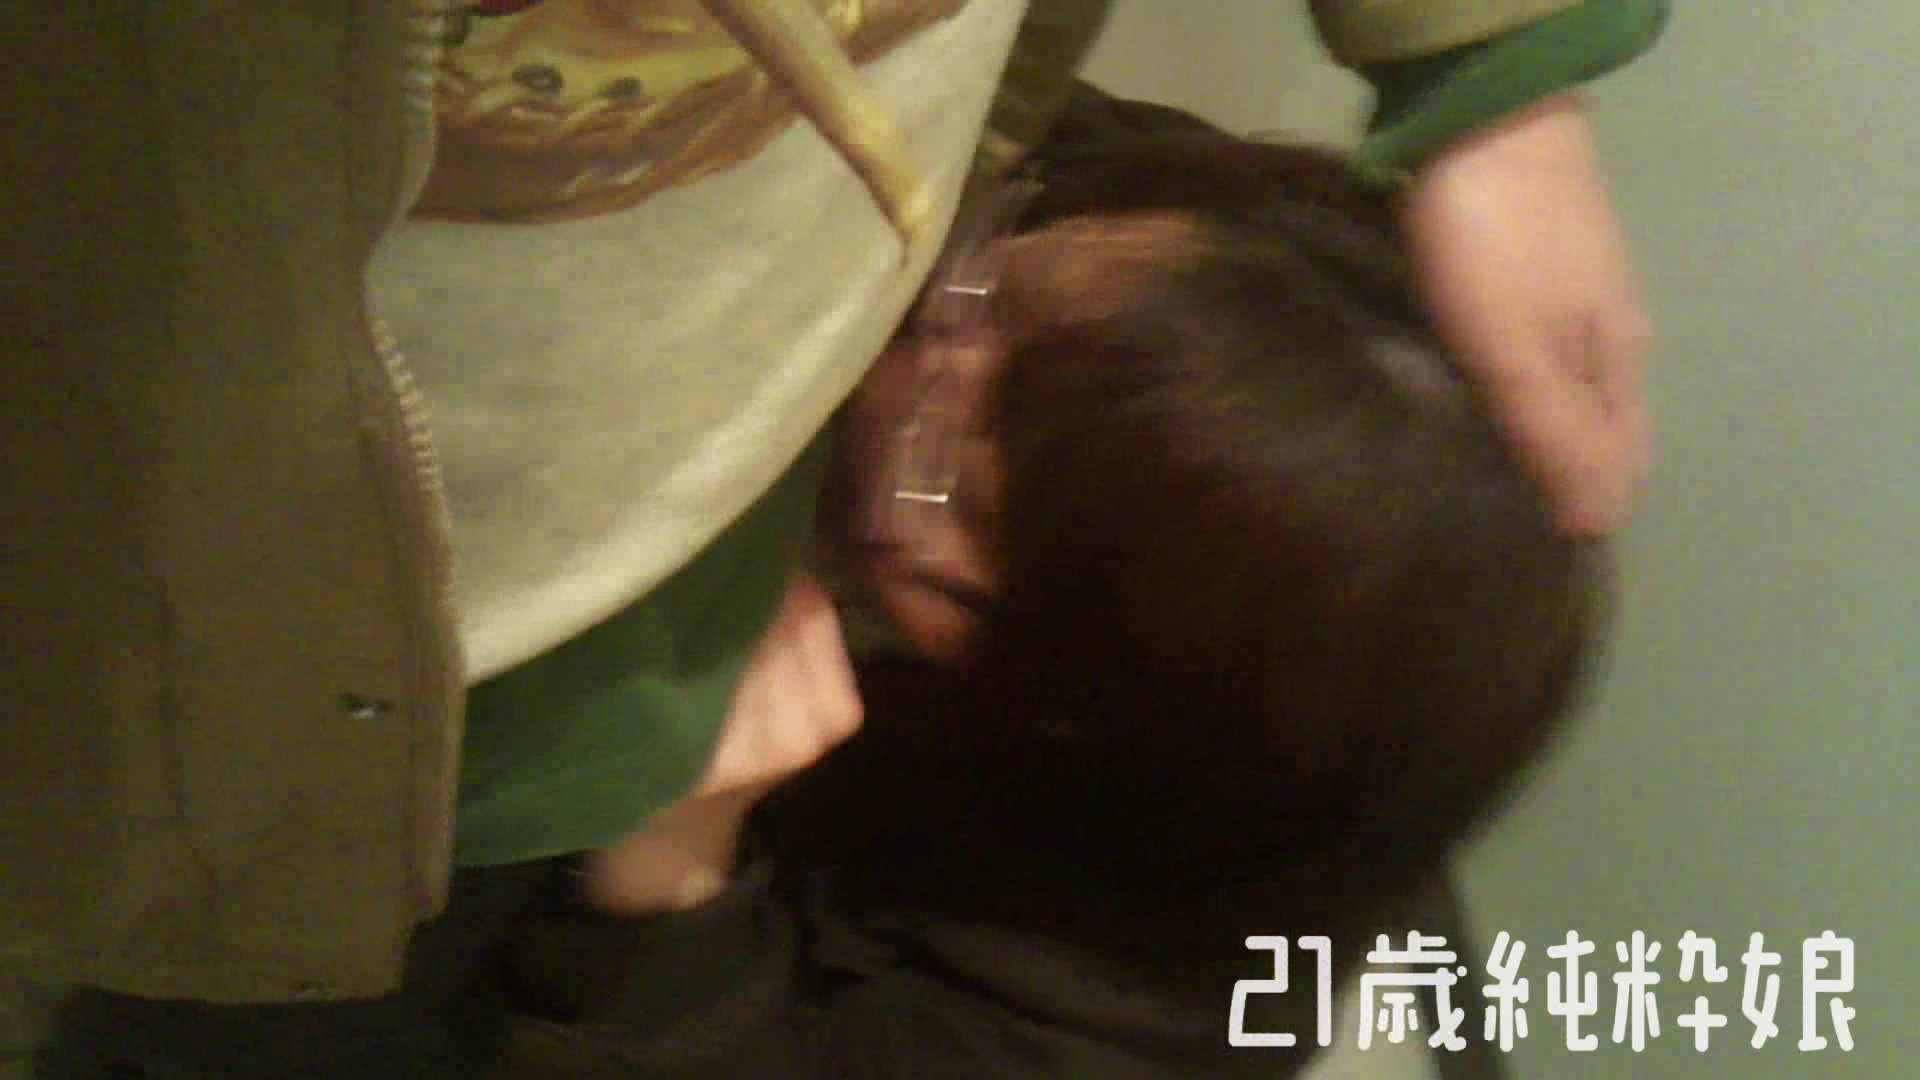 Gカップ21歳純粋嬢第2弾Vol.5 OLヌード天国  110PIX 52